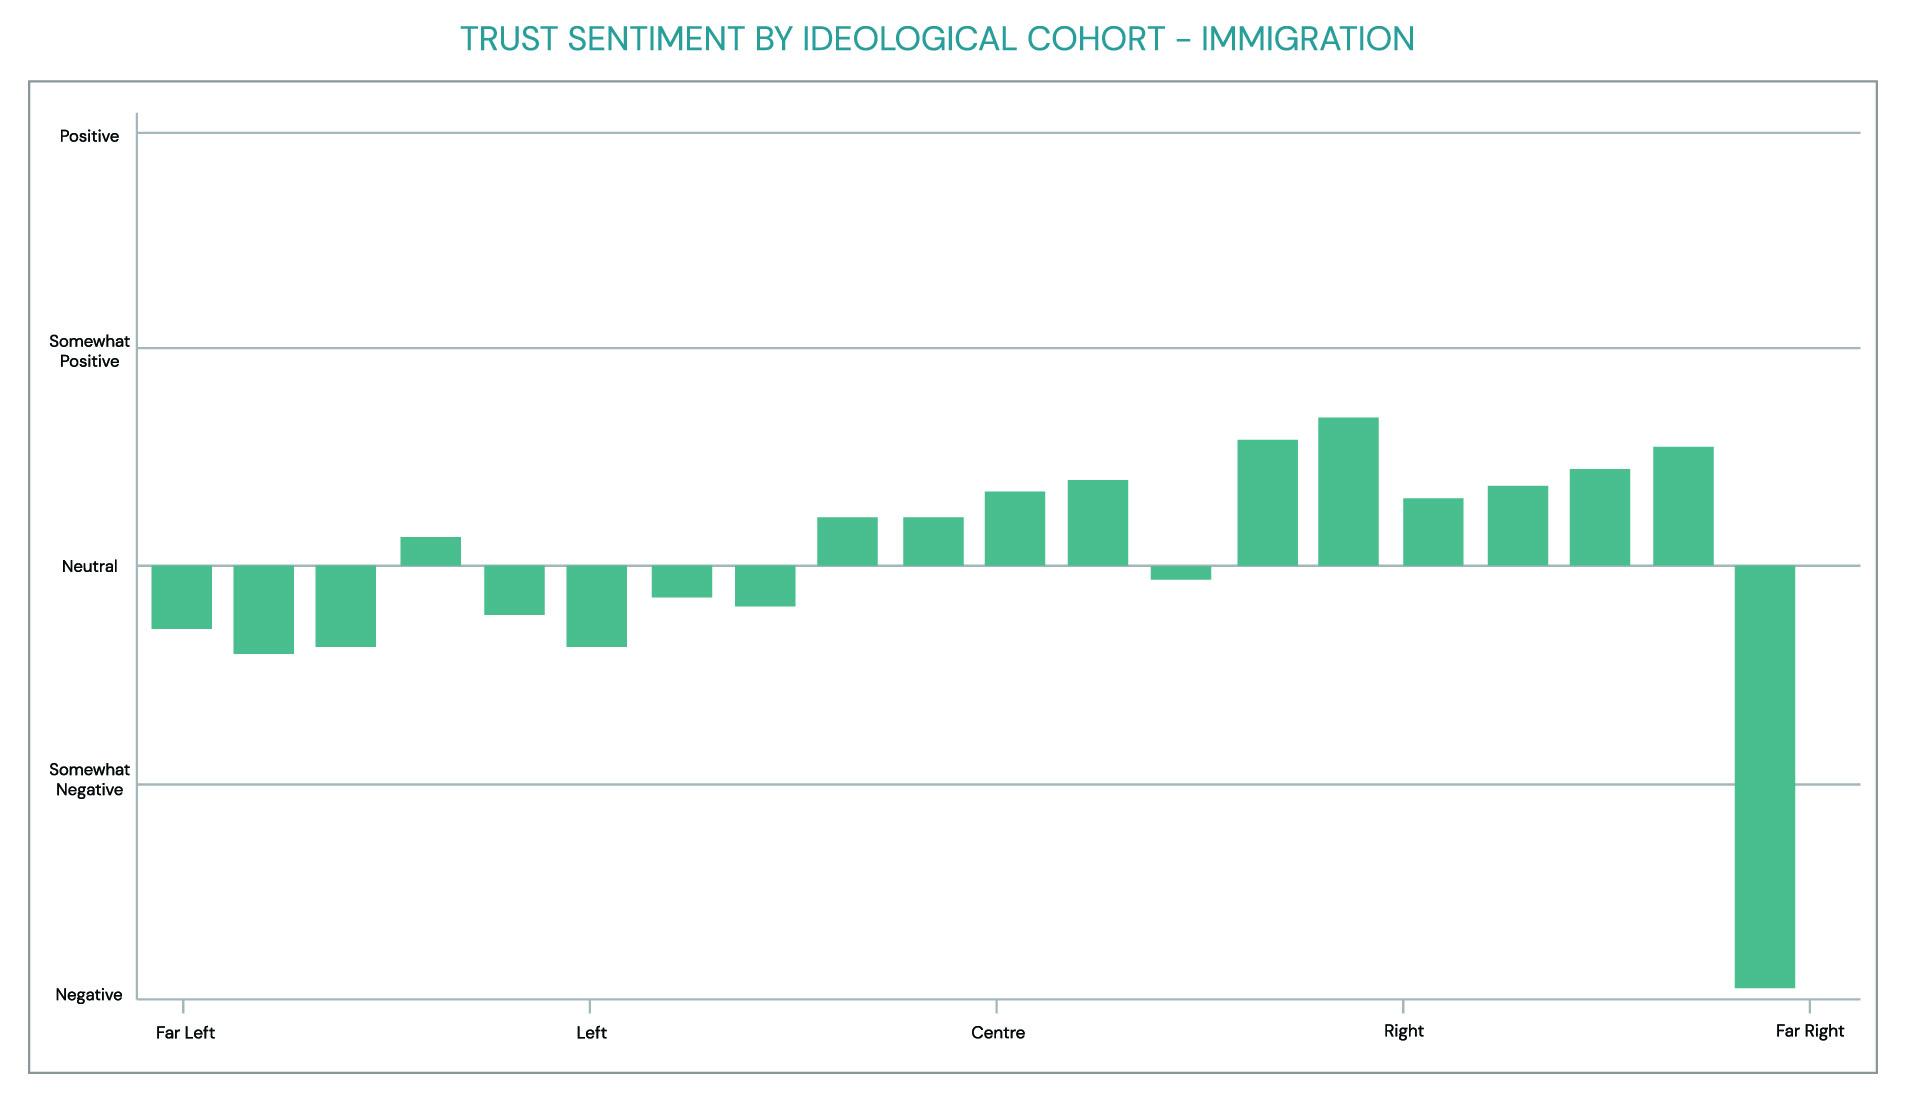 trust sentiment by ideological cohort: immigration